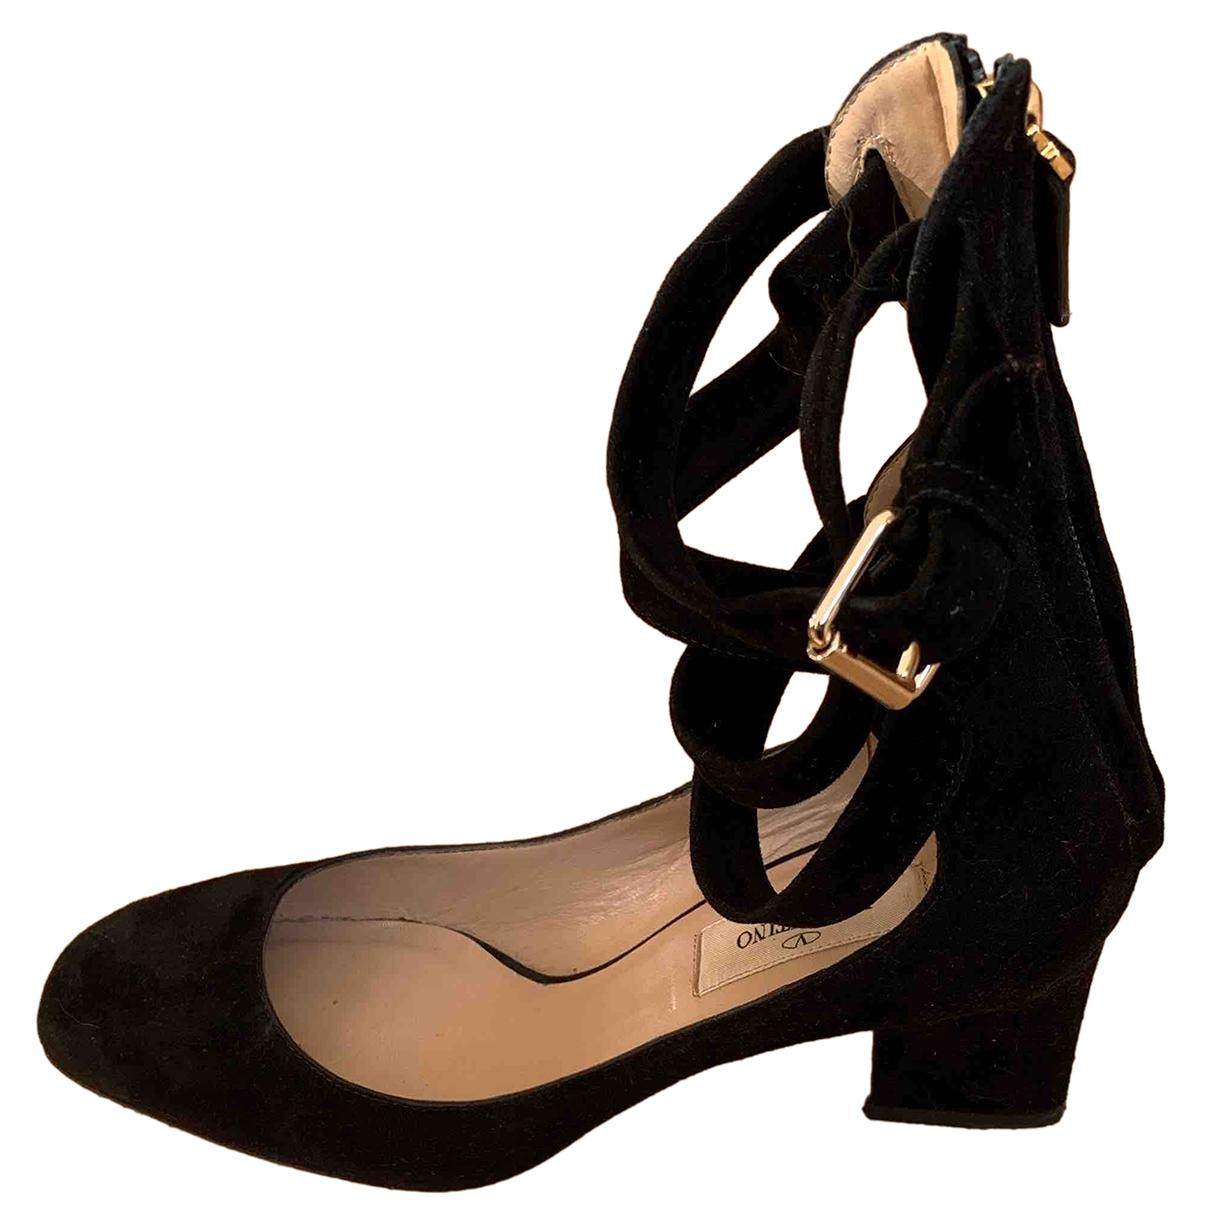 Valentino Garavani - Escarpins Tango pour femme en suede - noir